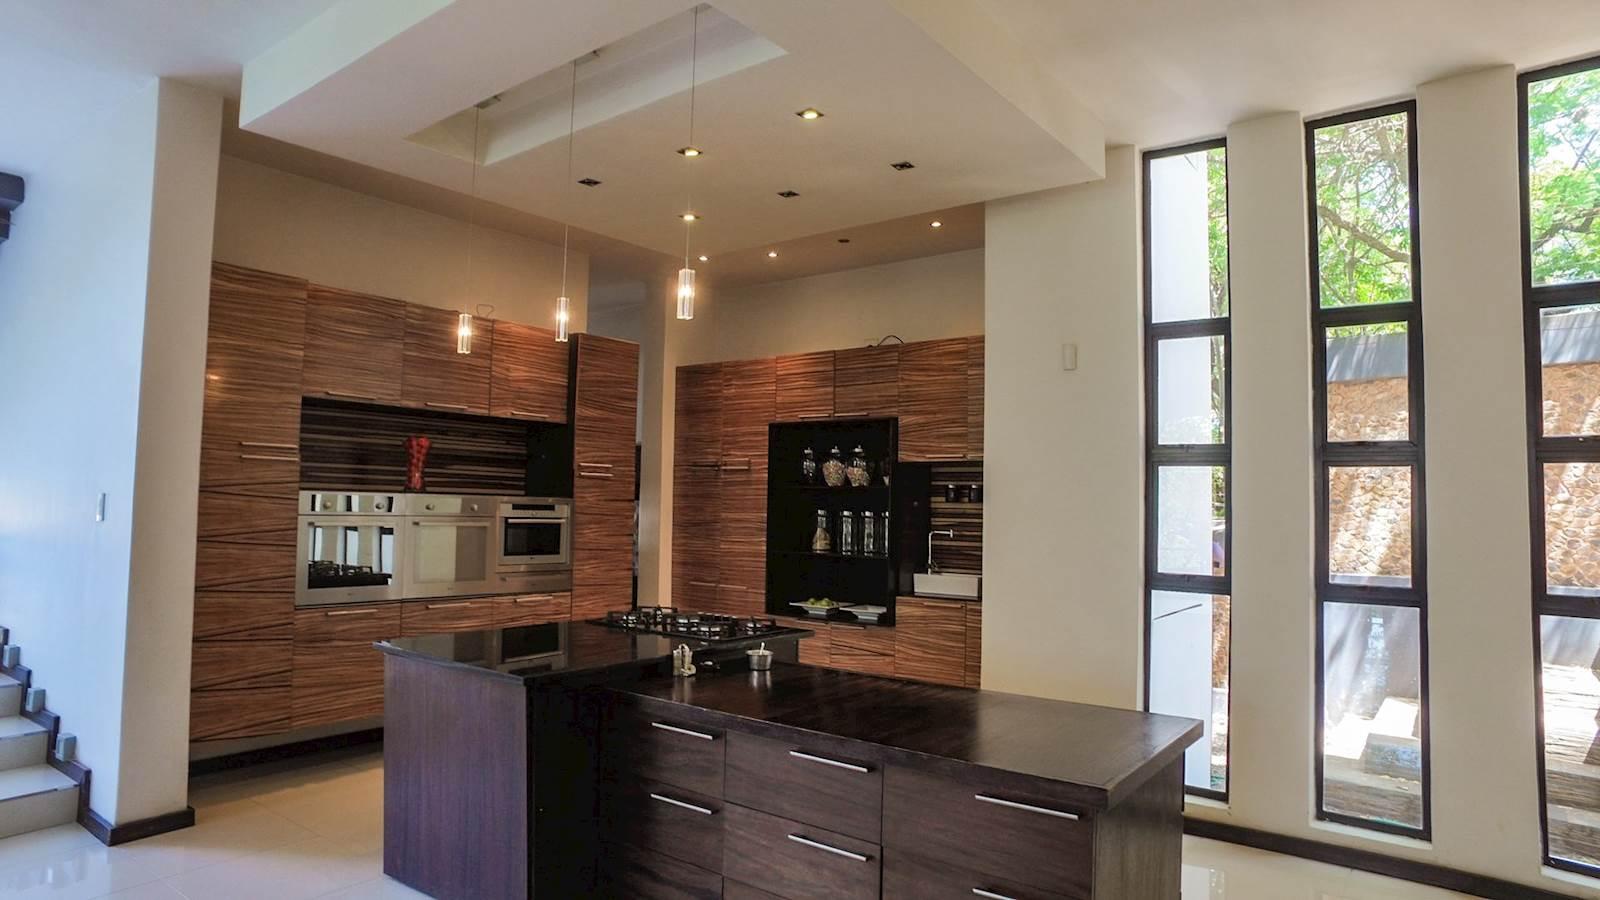 3 Bedroom House sold in Waterkloof Ridge ENT0010698 : photo#3